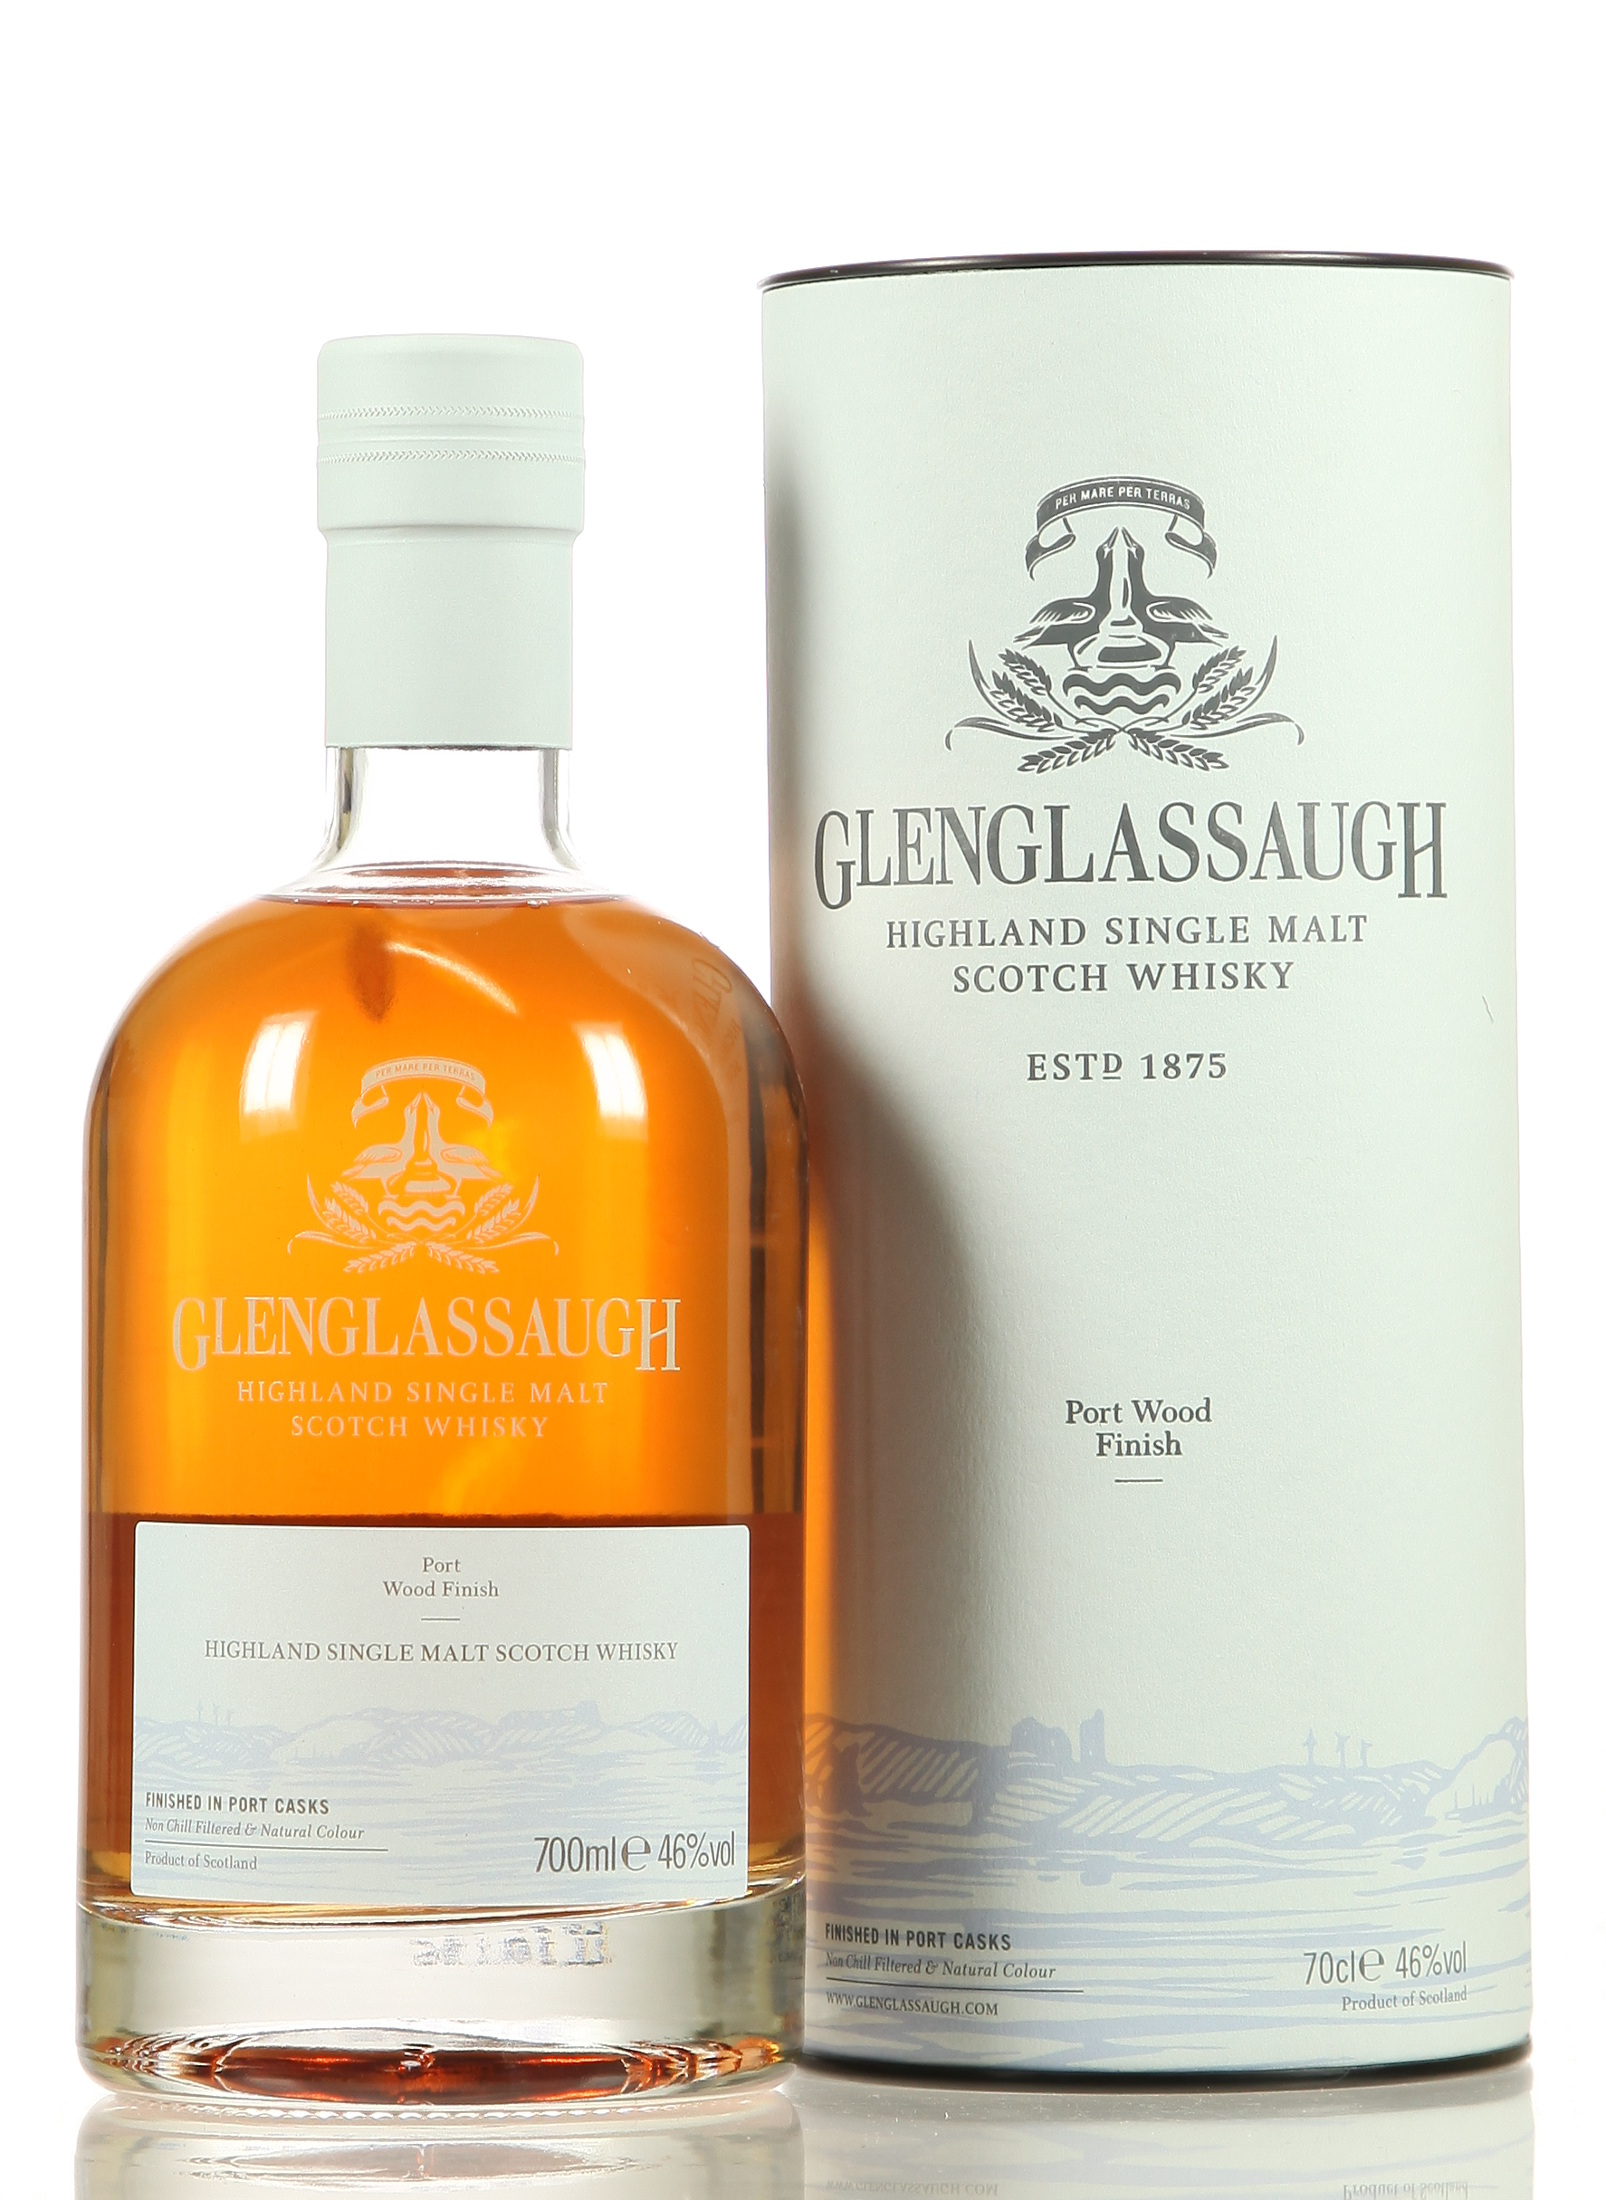 Glenglassaugh Port Finish